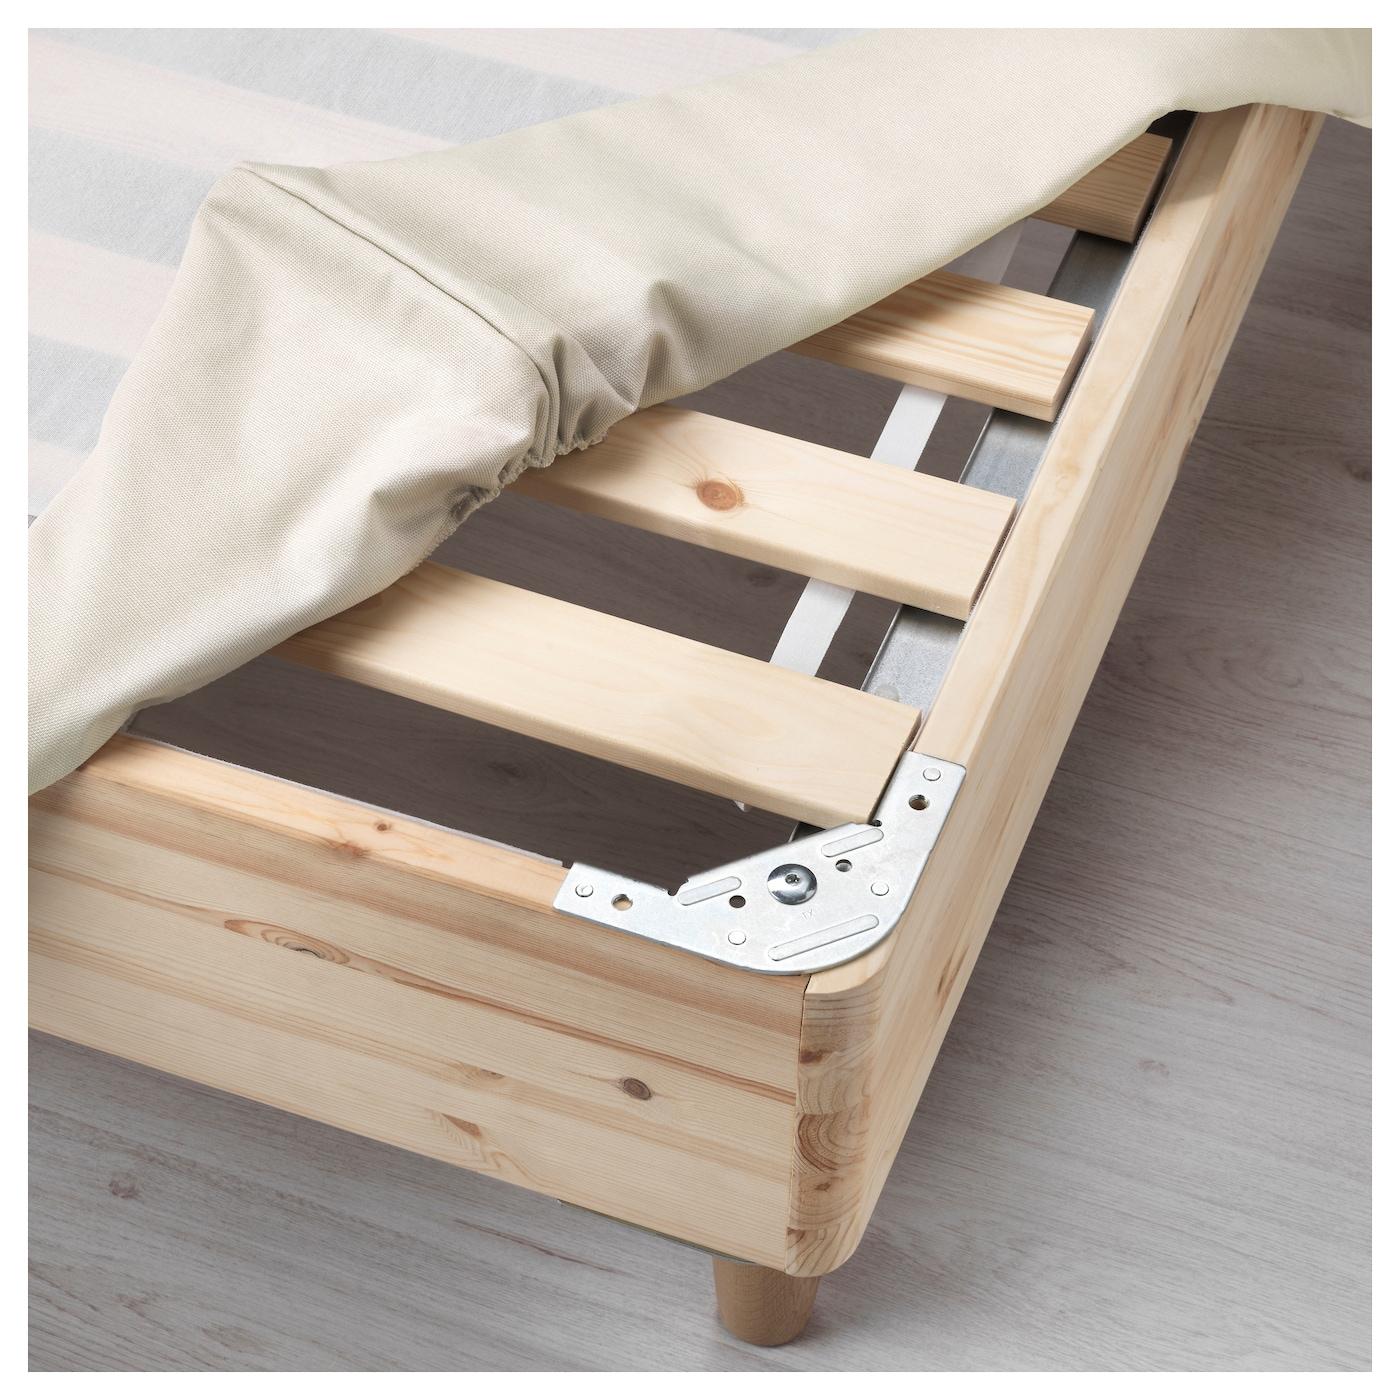 espev r sommier lattes beige 90x200 cm ikea. Black Bedroom Furniture Sets. Home Design Ideas